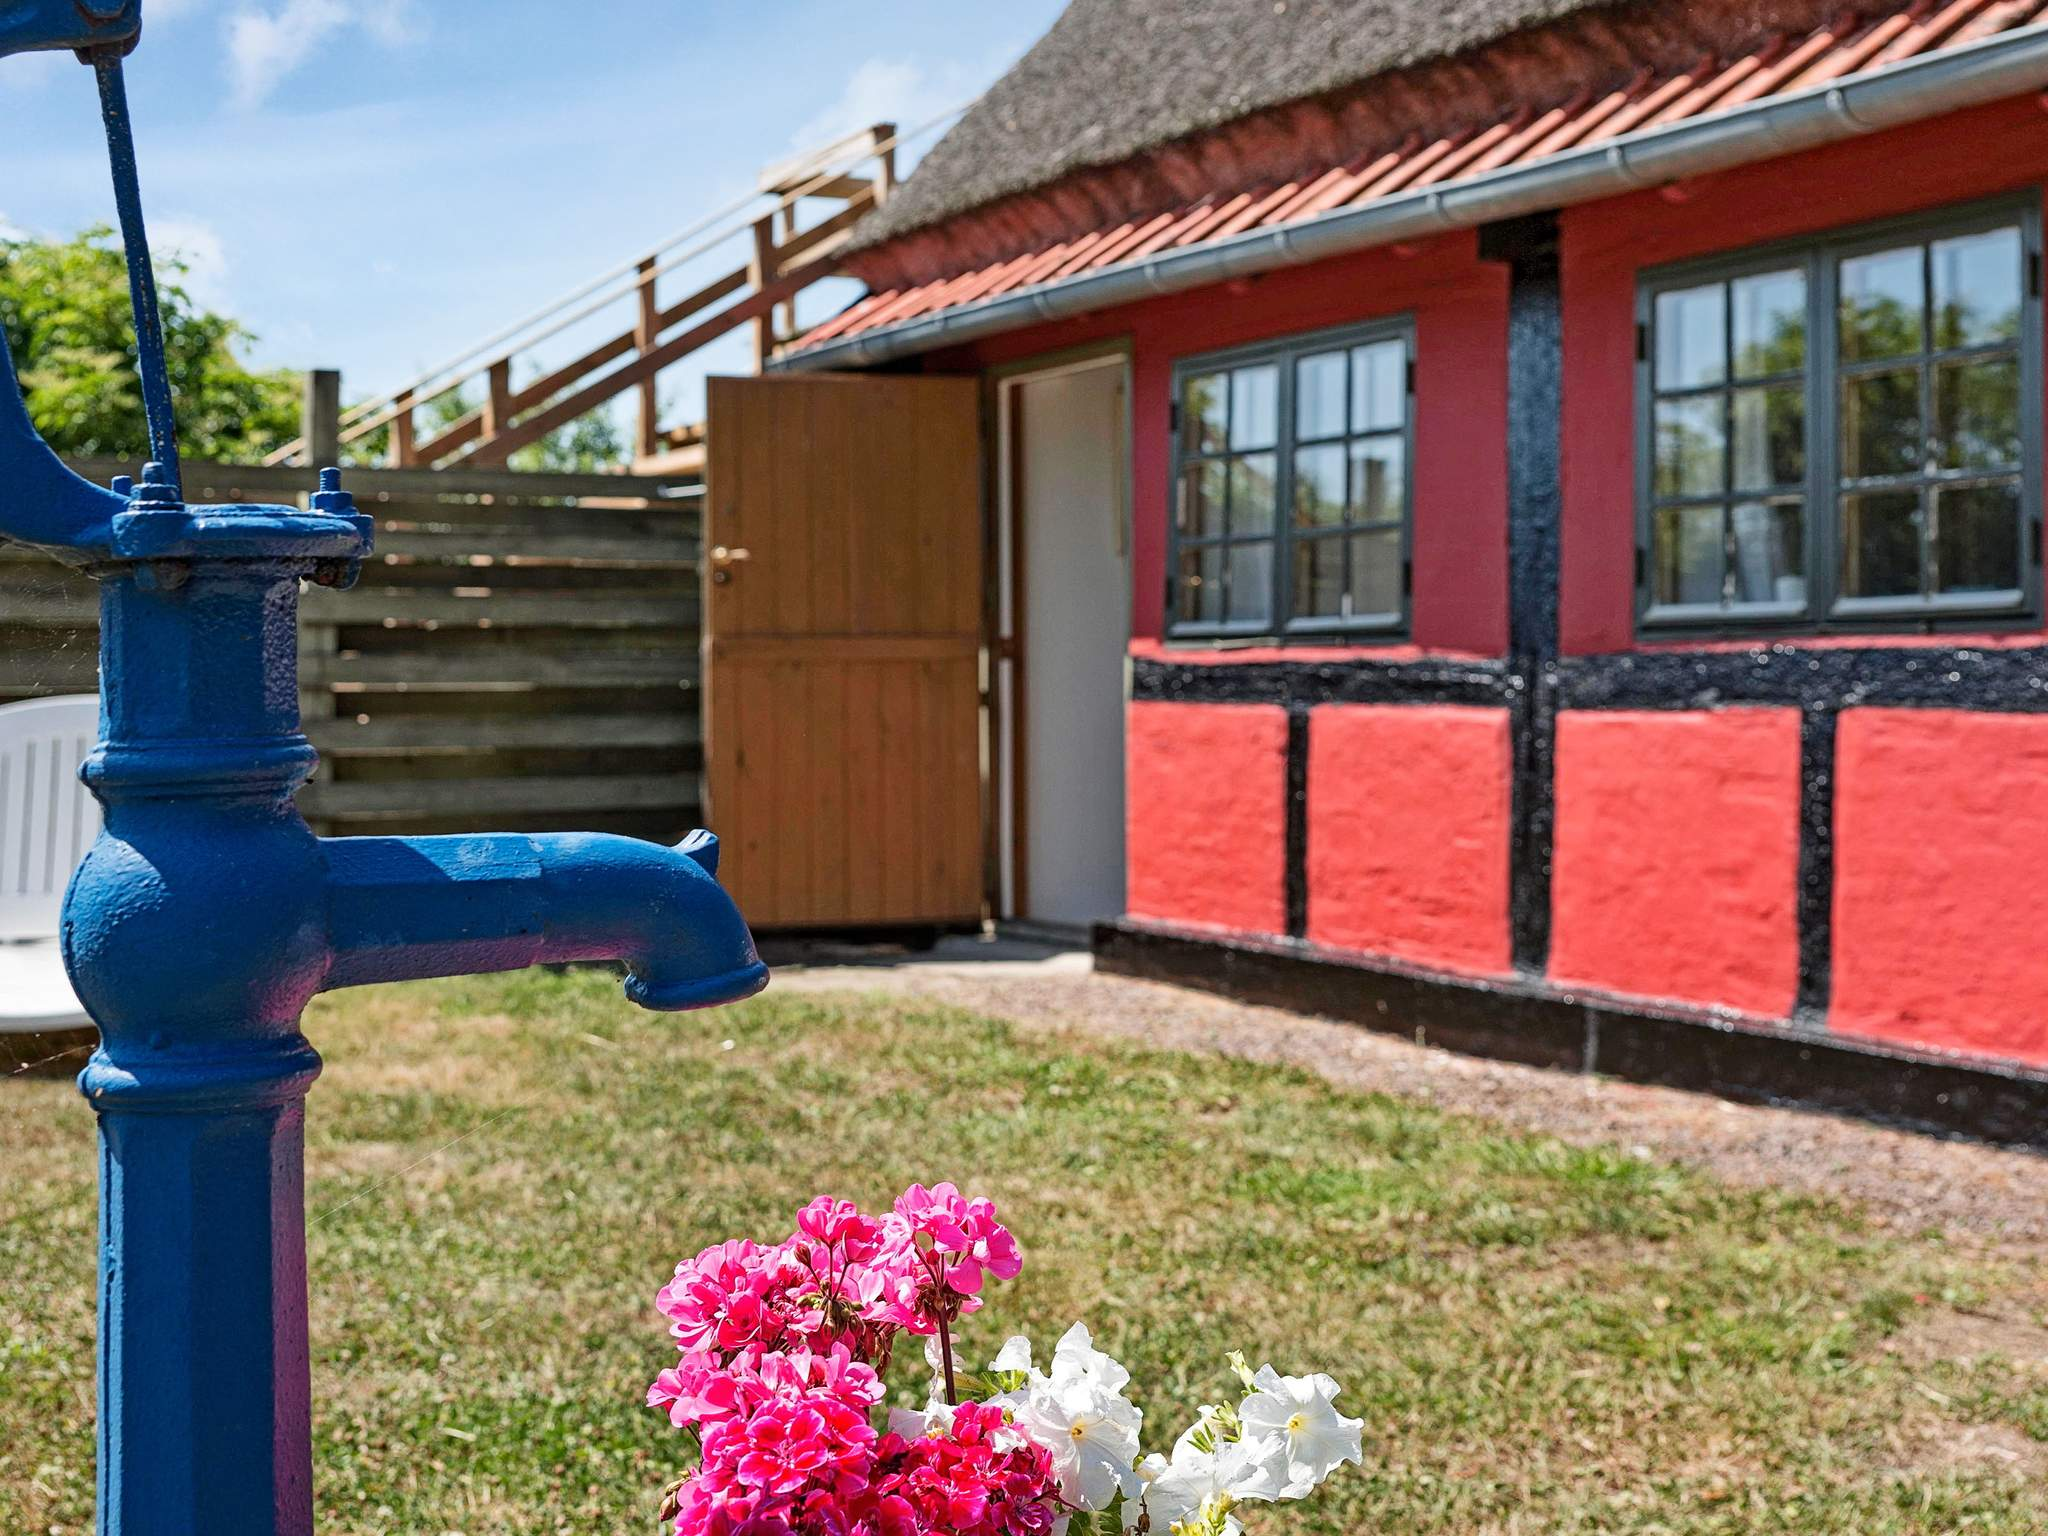 Ferienhaus Balka Strand (81872), Balke, , Bornholm, Dänemark, Bild 1